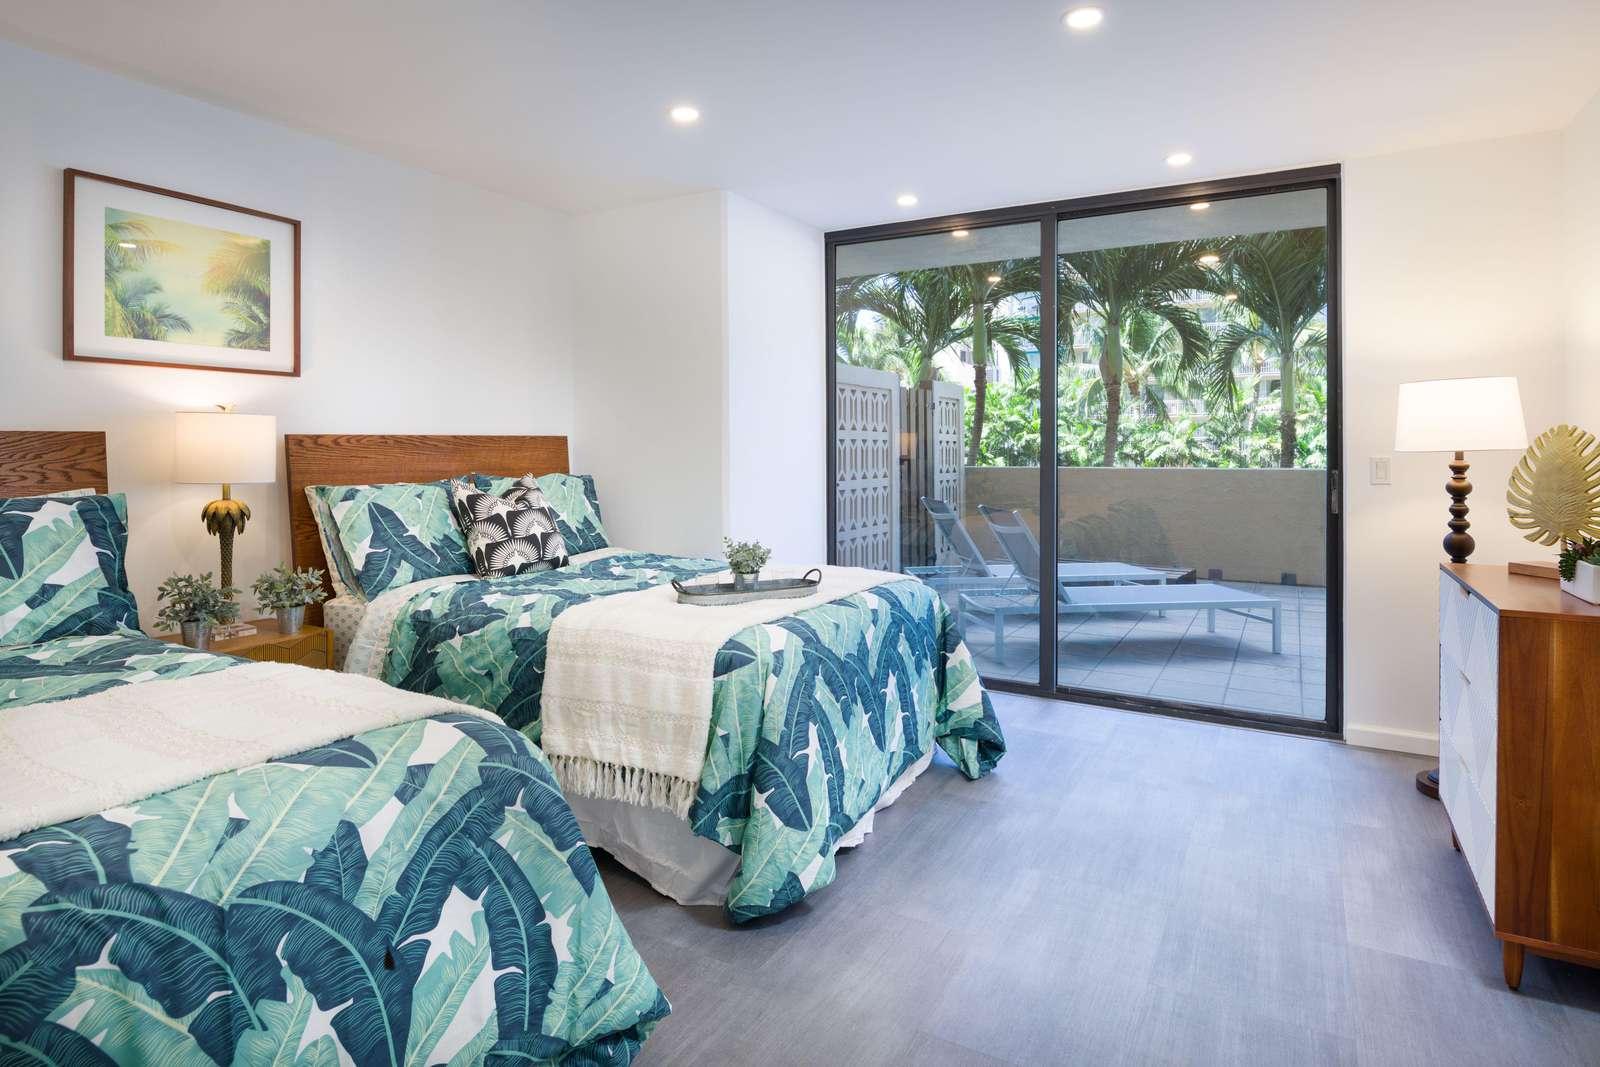 Spectacular 1 bedroom at Aloha Towers Waikiki DH Apt 3